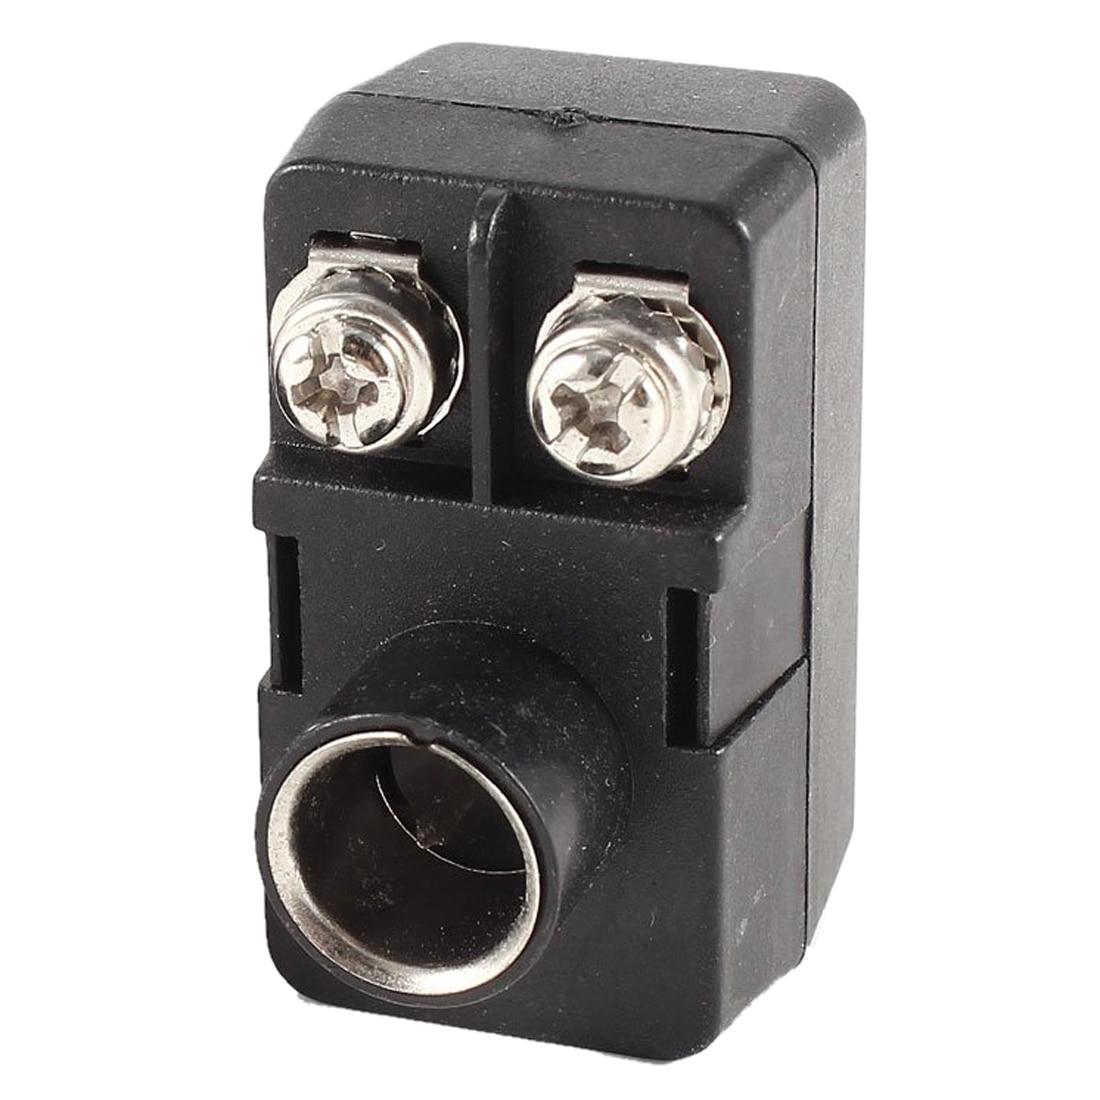 Brand New 2 X Push-On Antenna Matching Transformer 300/75 Ohm TV F Coax Adapter